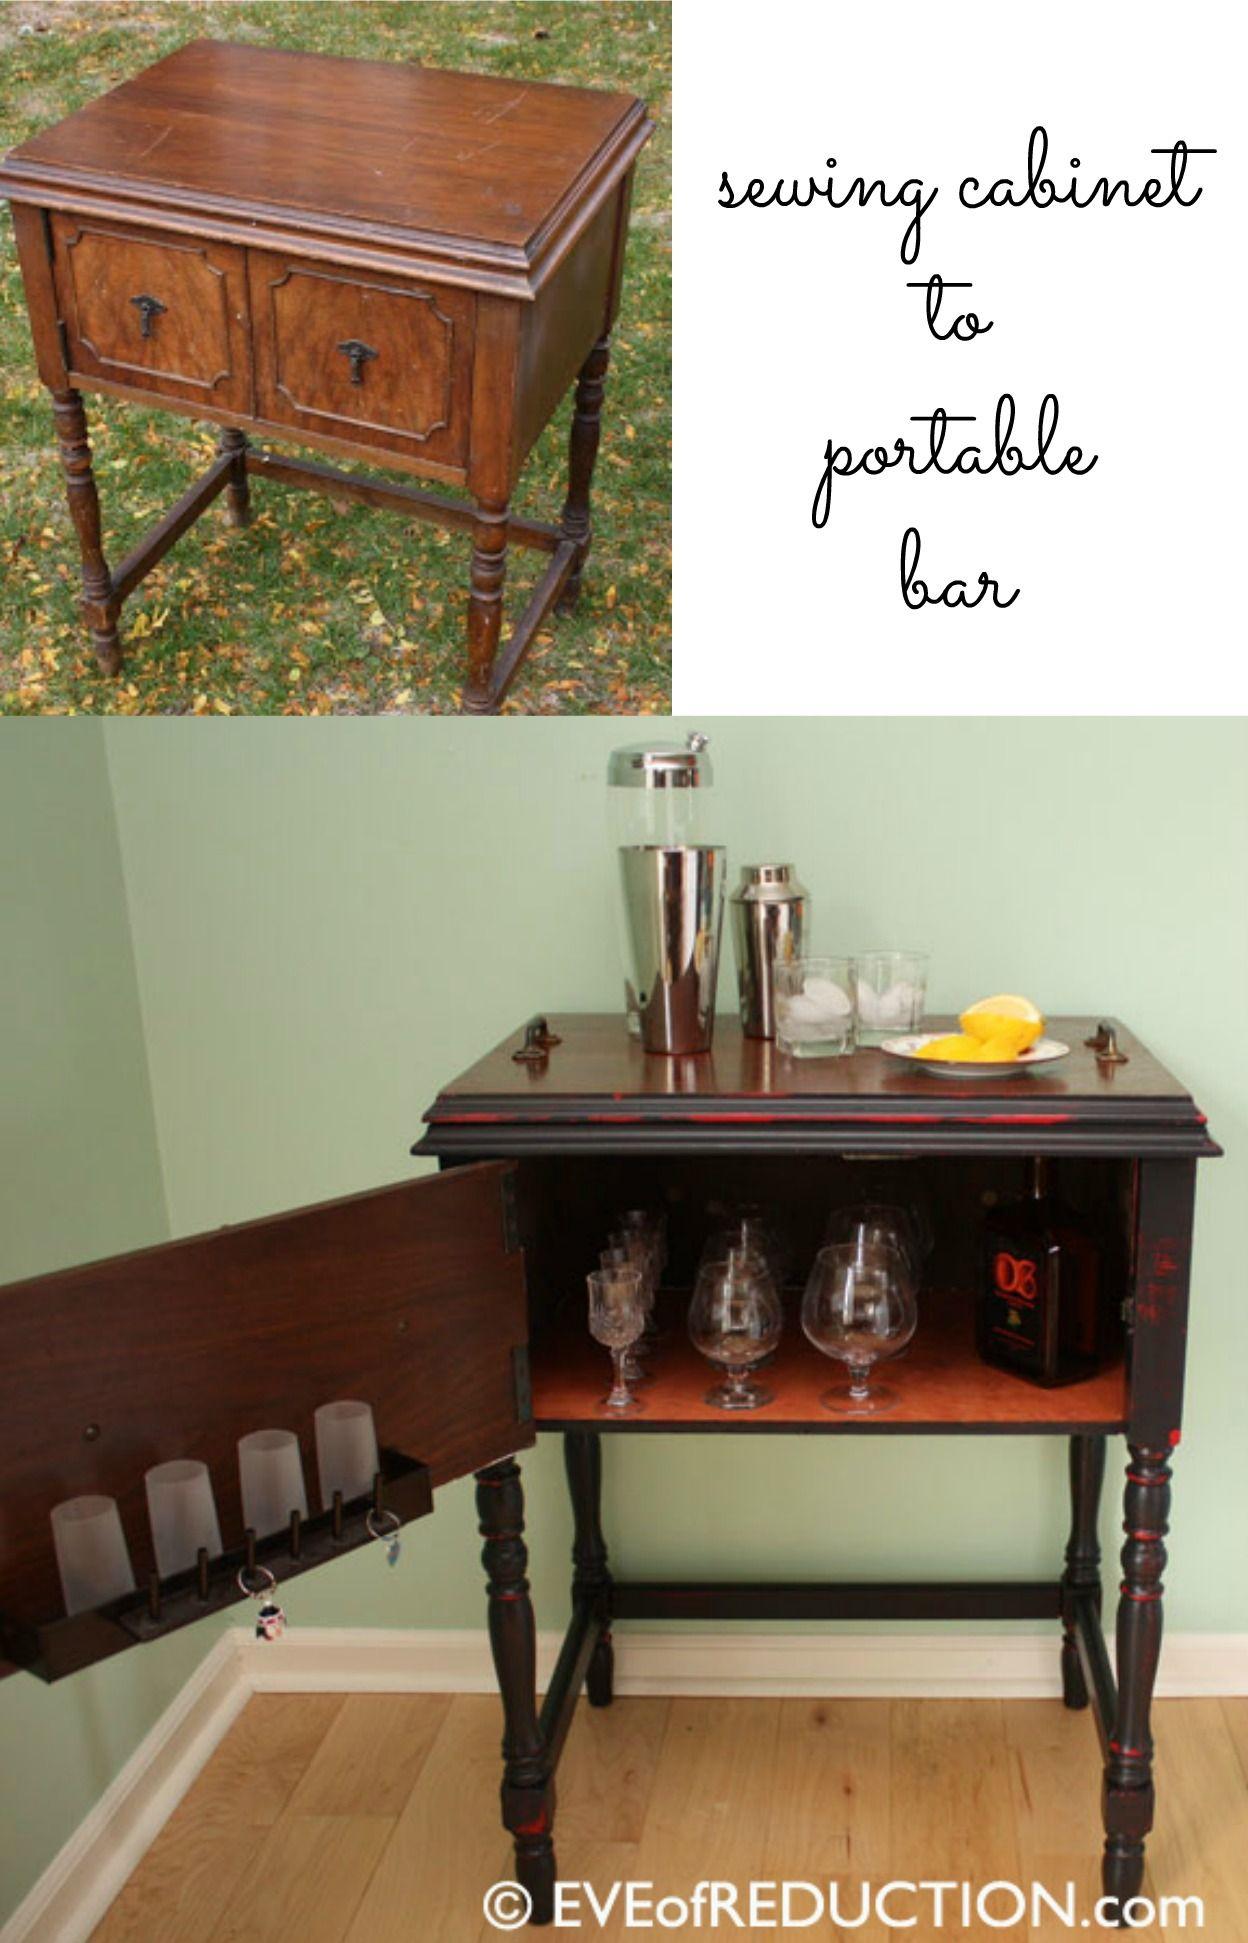 Sewing Cabinet Bar My Repurposed Life Rescue Re Imagine Repeat